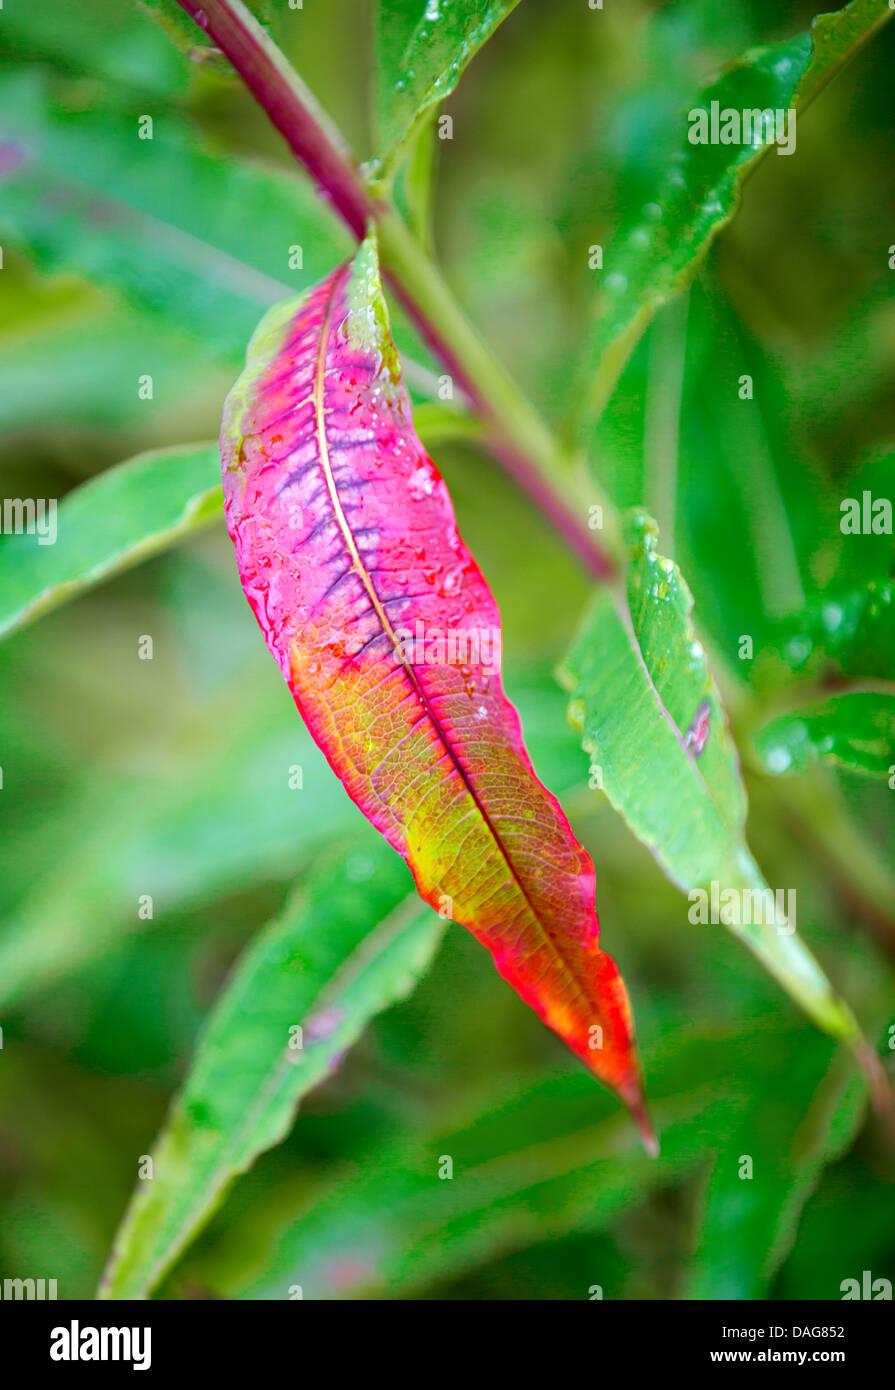 fireweed, blooming sally, rosebay willow-herb, great willow-herb (Epilobium angustifolium, Chamaenerion angustifolium), Stock Photo